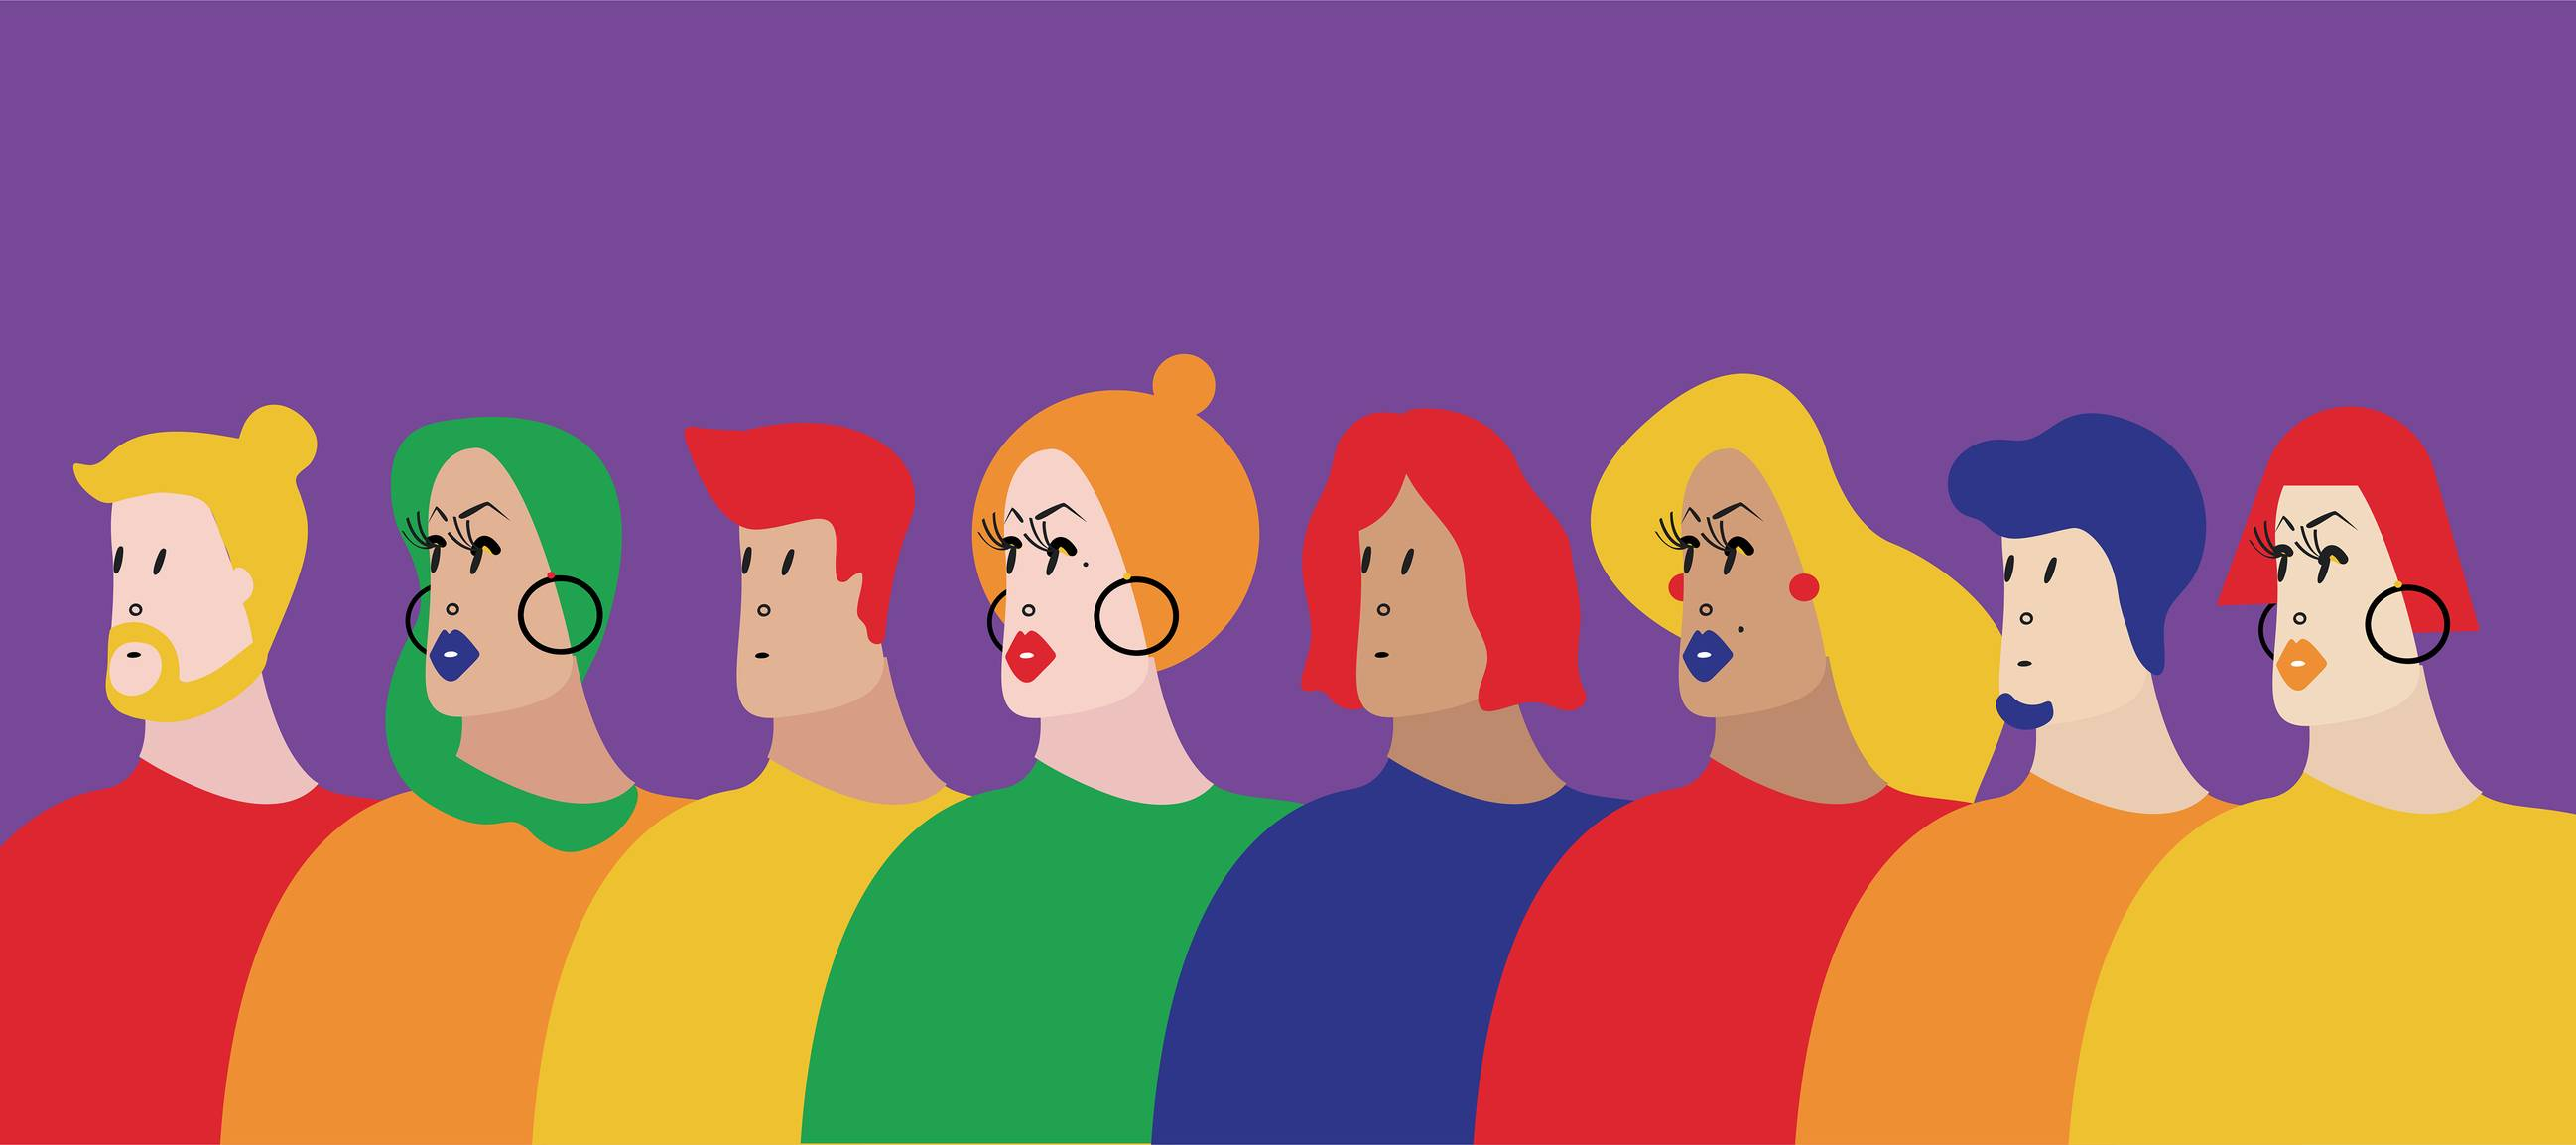 www.juicysantos.com.br - mulheres trans em santos